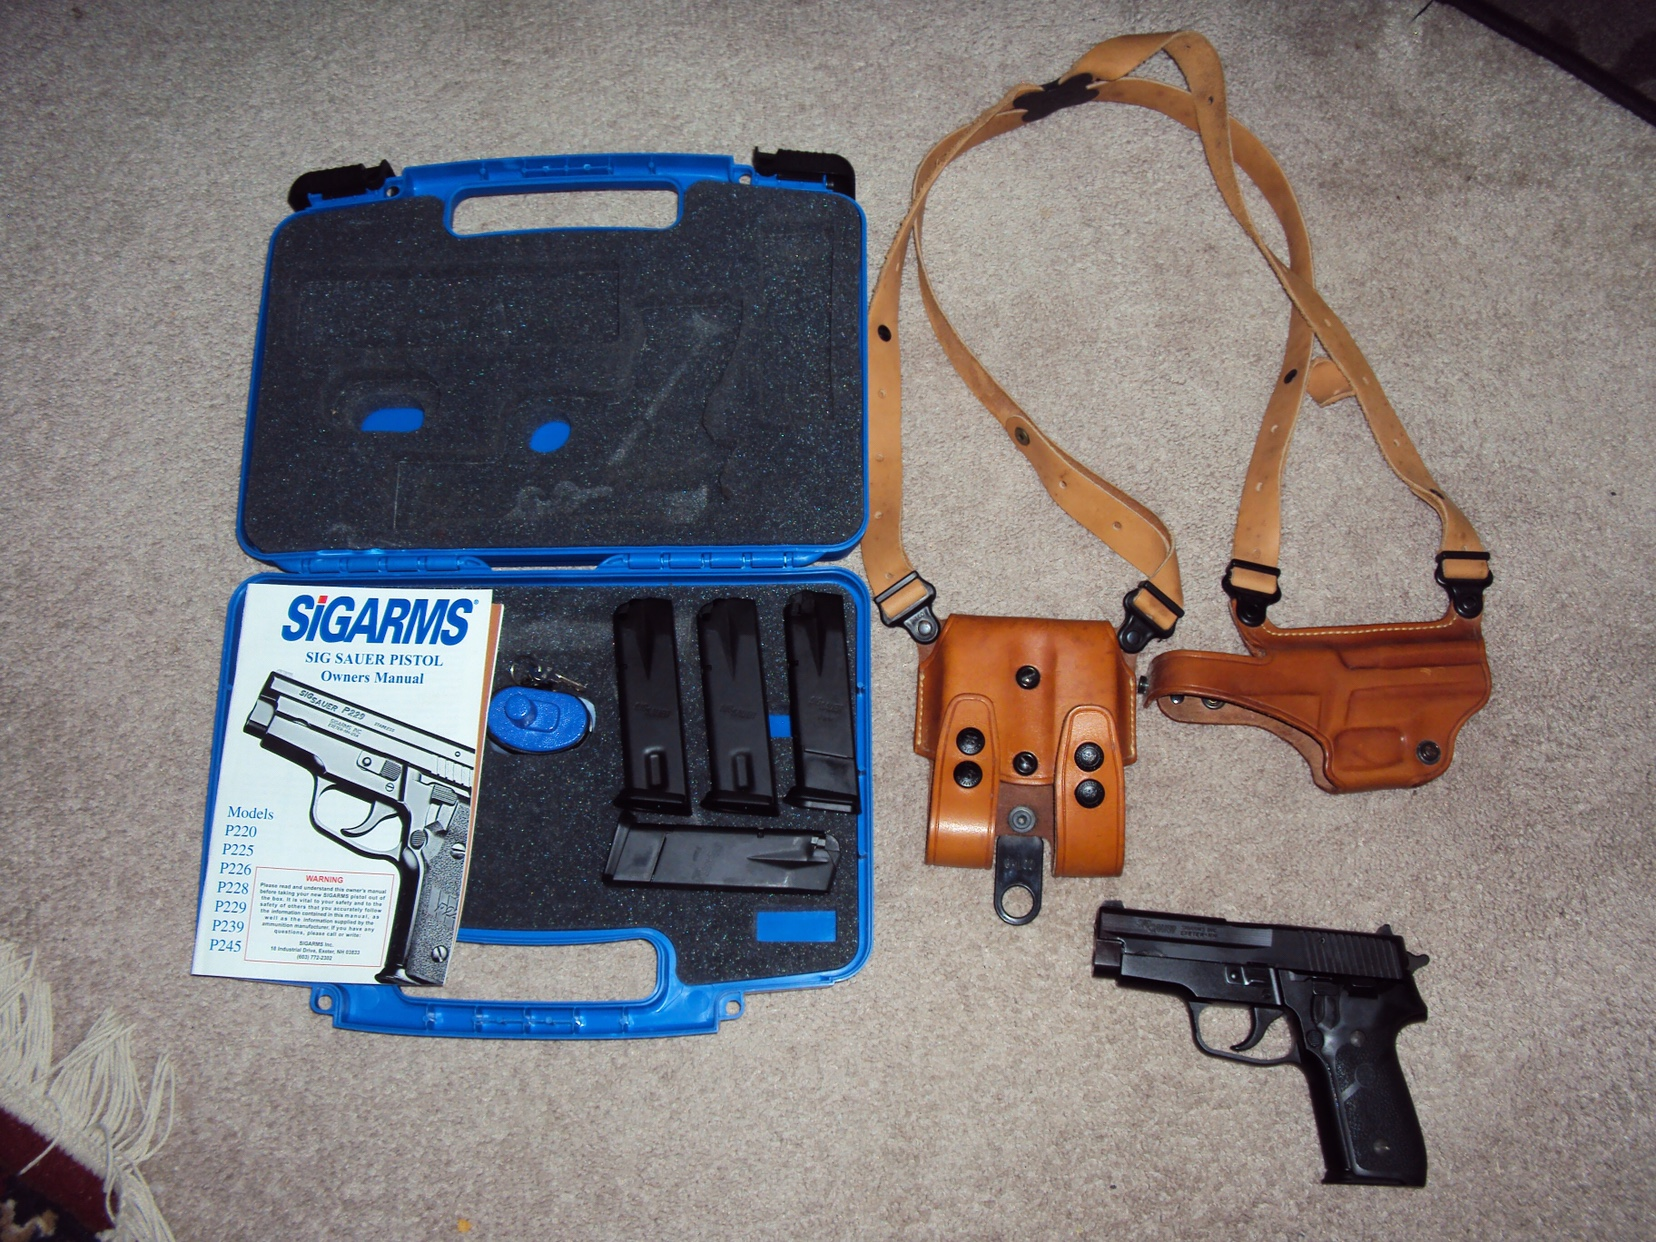 Sigarms Sig Sauer Pistol P220 P225 P226 P228 P229 P239 P245 Owner/'s Manual